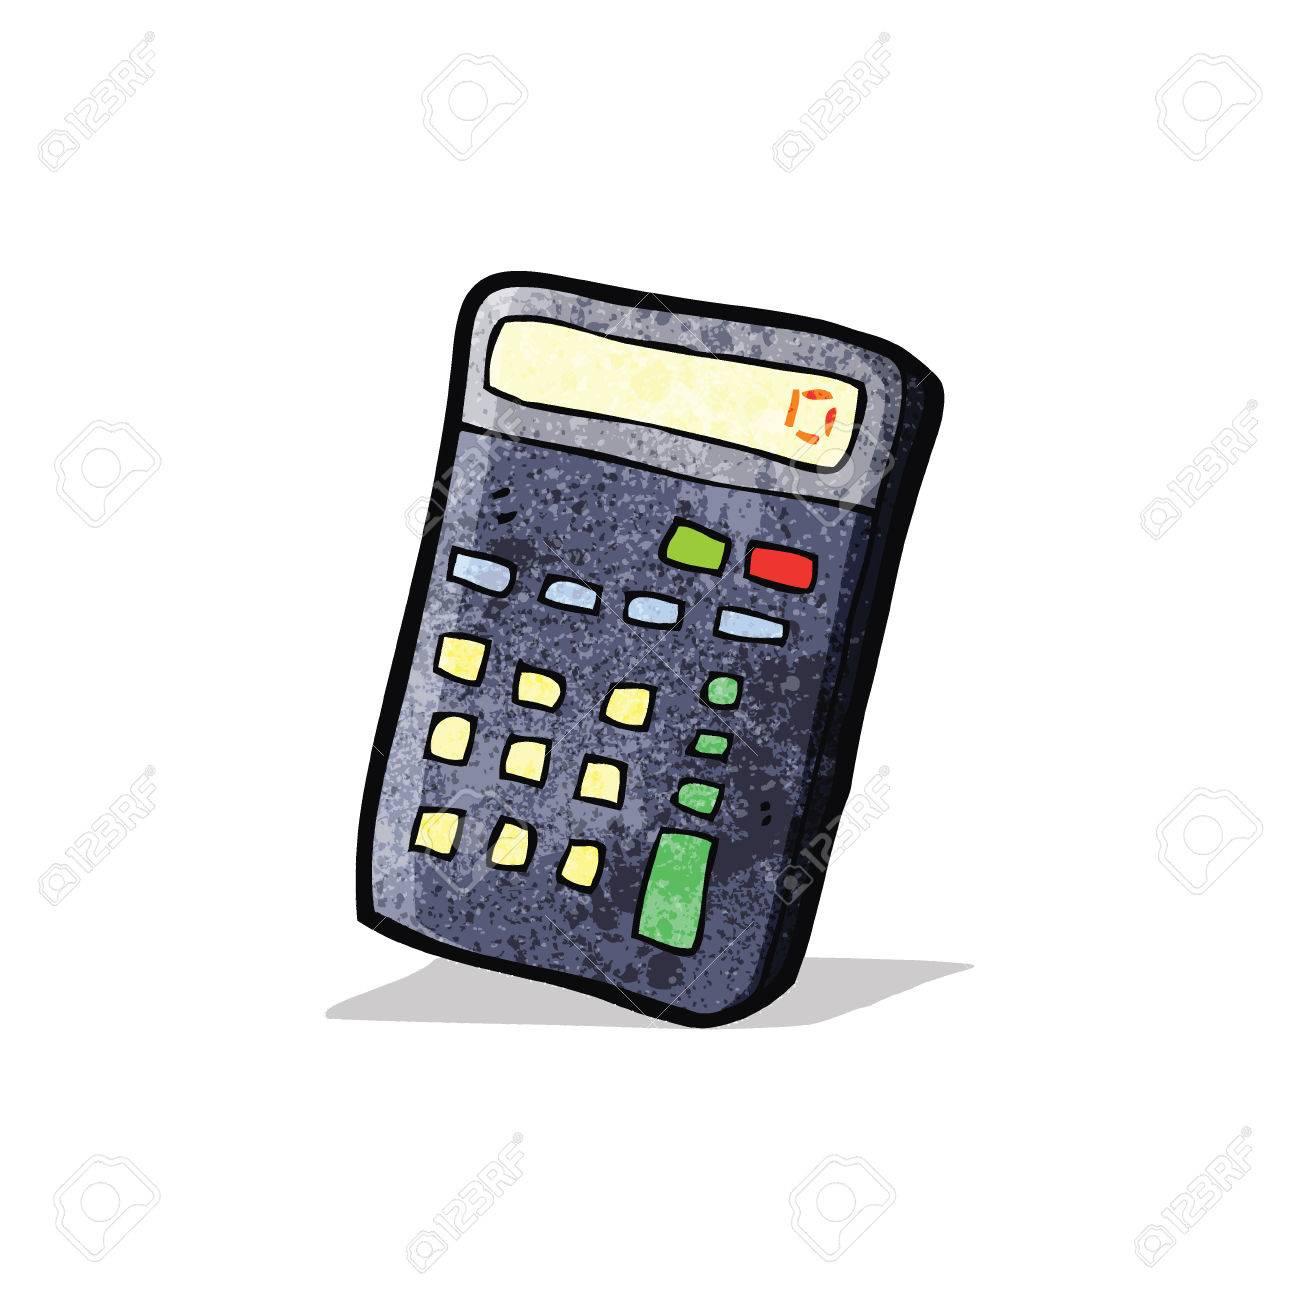 cartoon calculator - 32629385